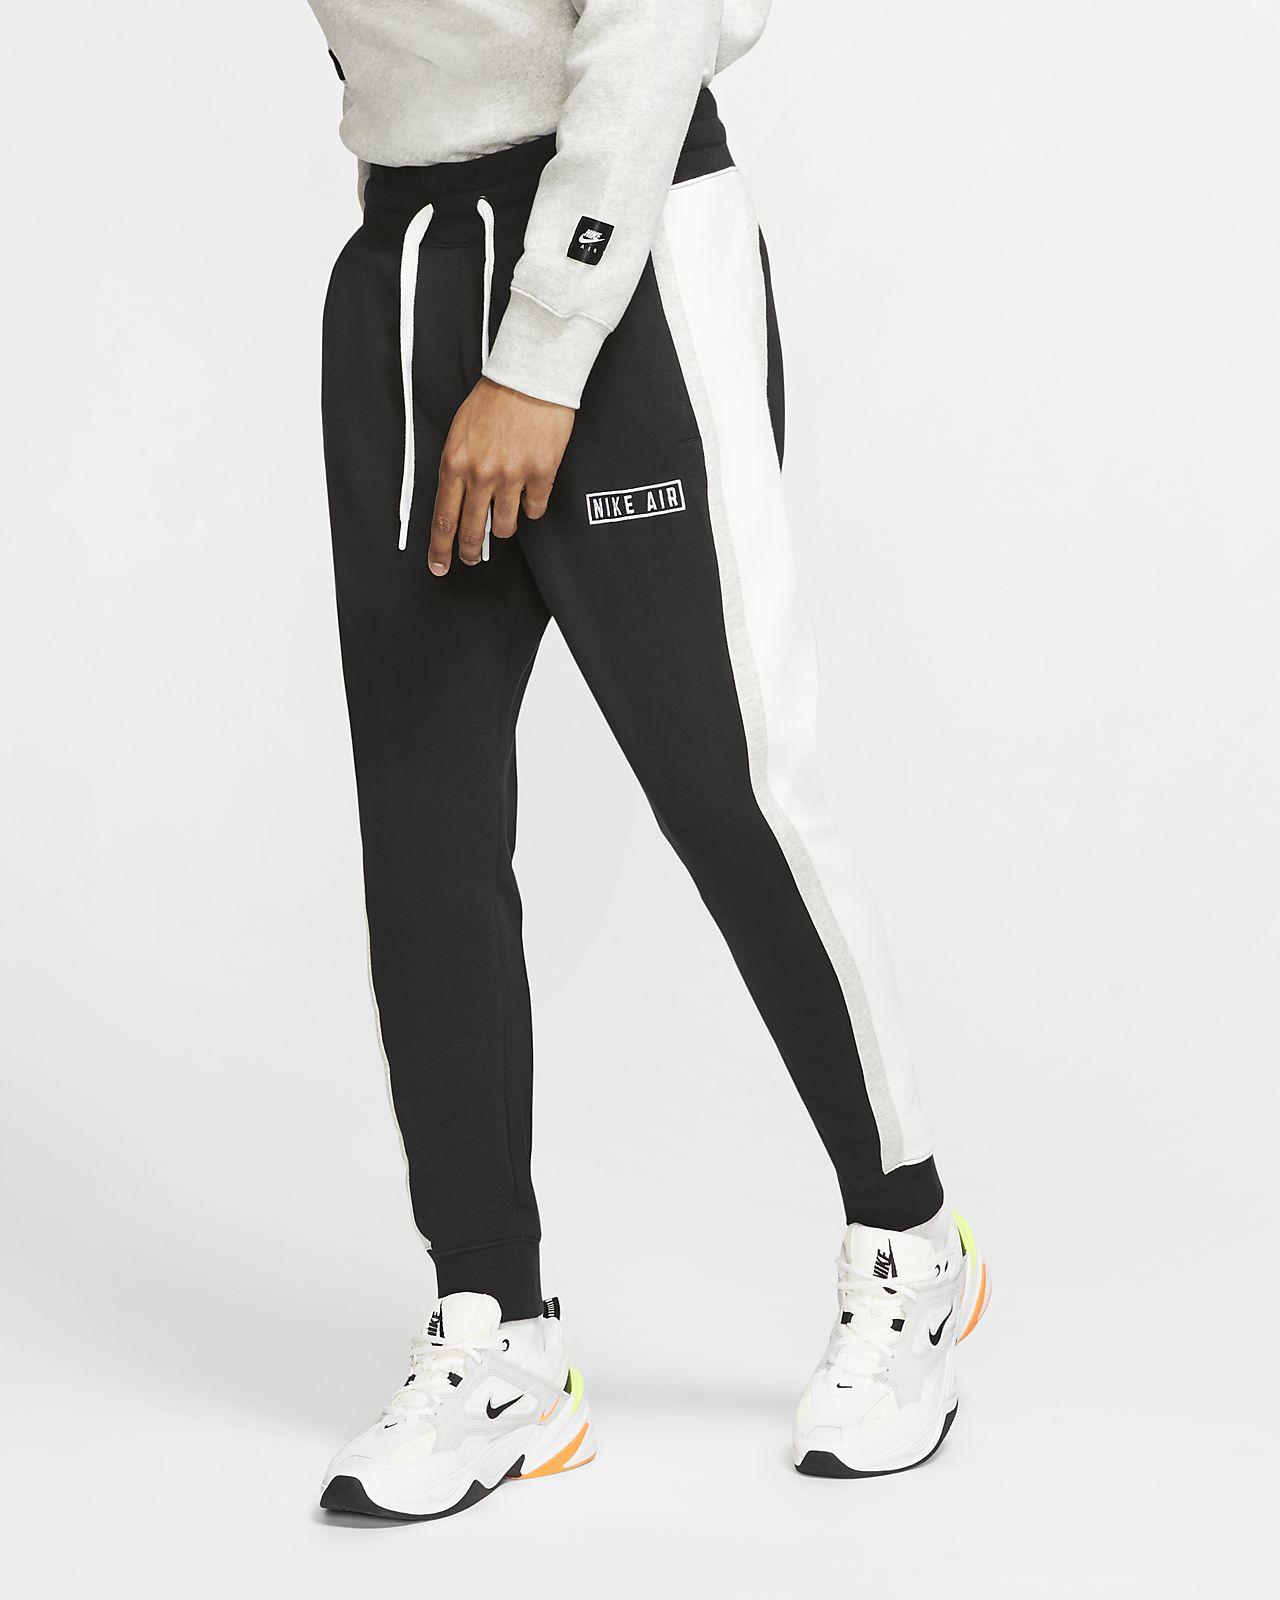 good service official new lifestyle Pantalon en tissu Fleece Nike Air pour Homme